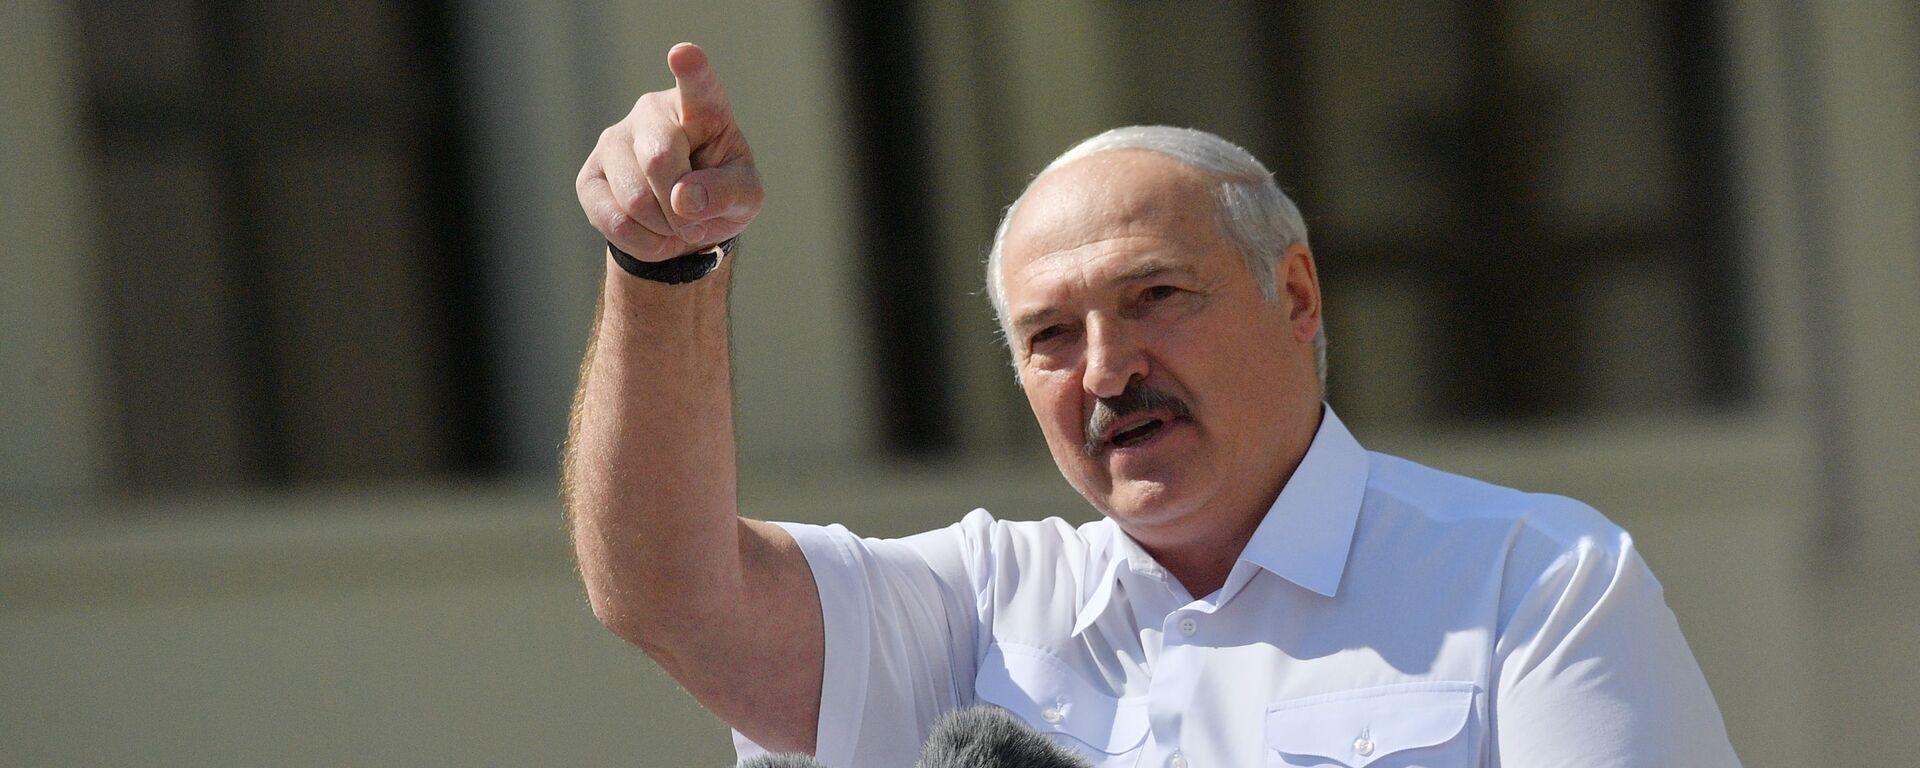 Alexandr Lukashenko, presidente bielorruso - Sputnik Mundo, 1920, 30.07.2021